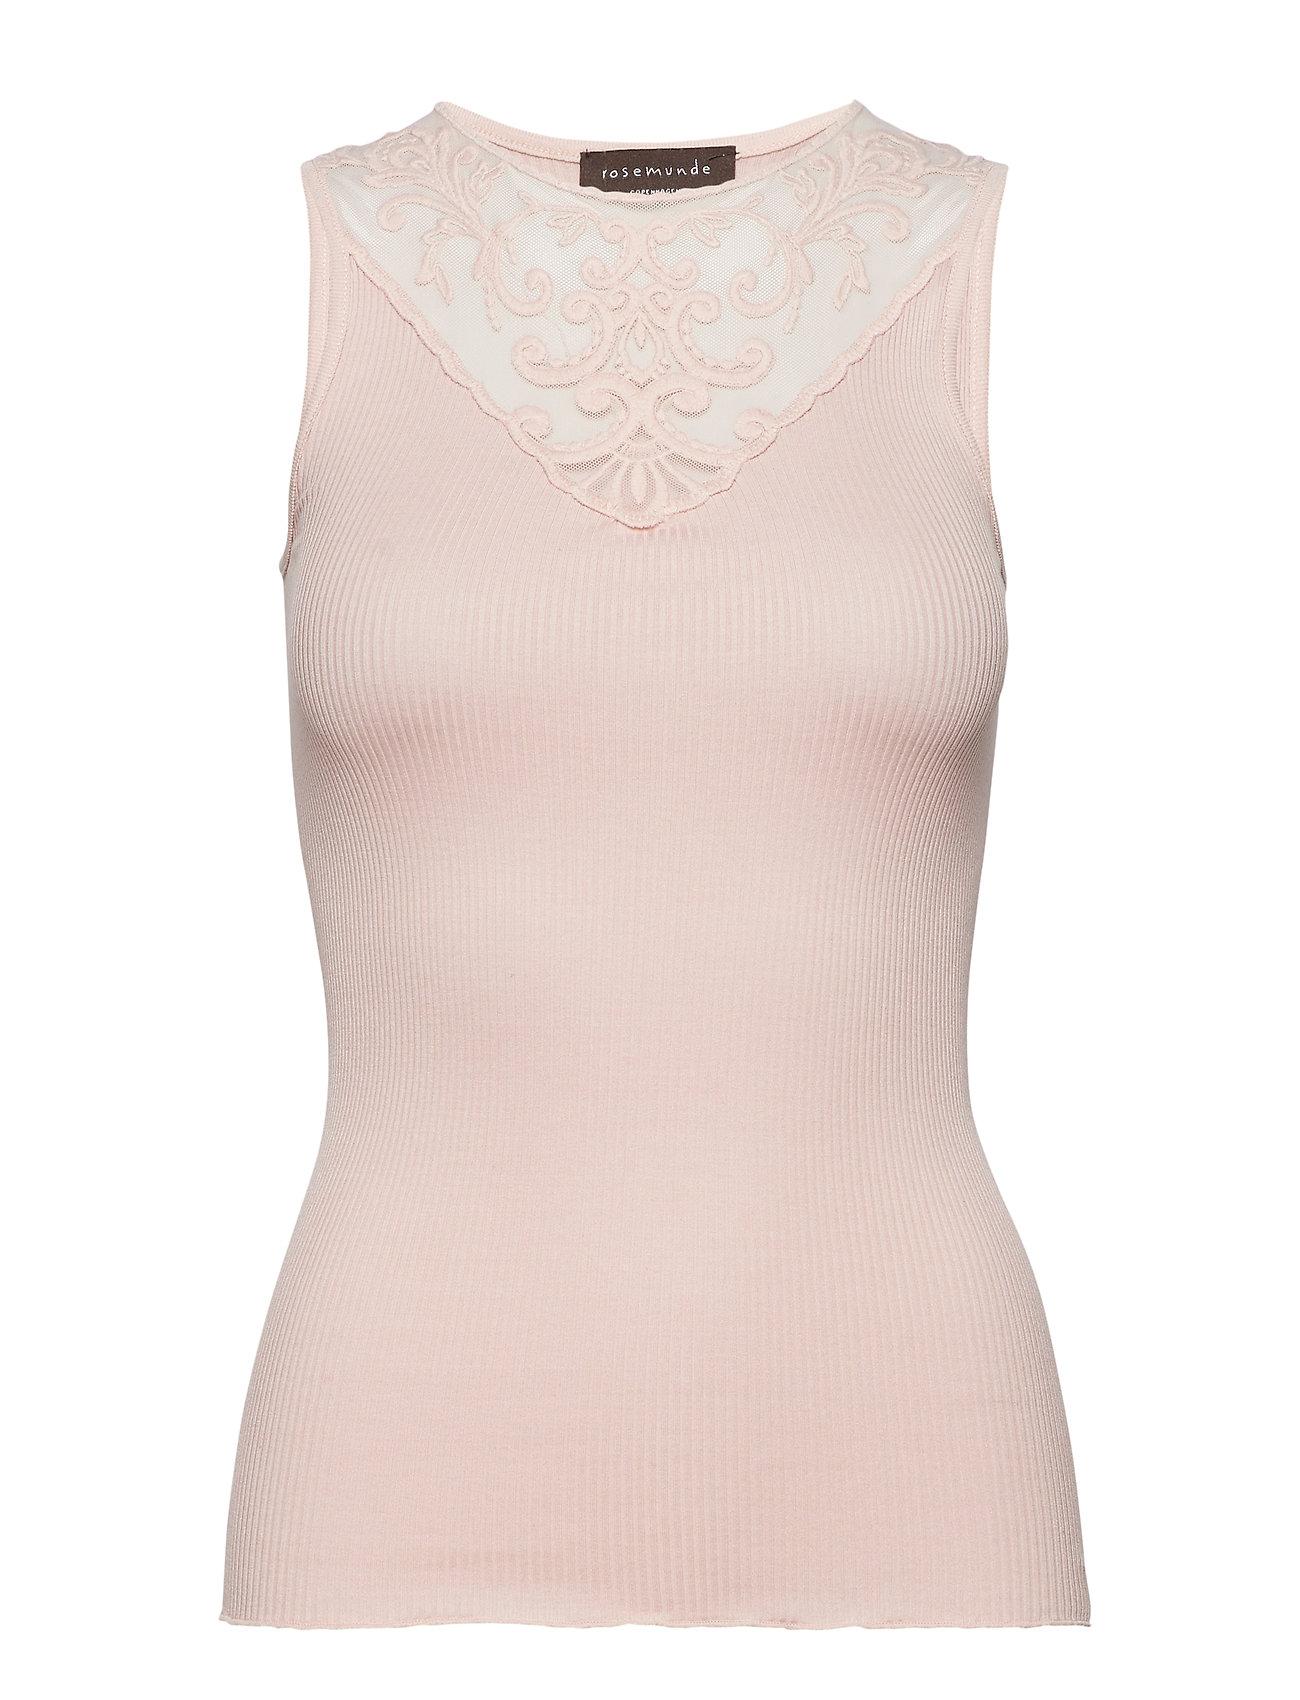 7d5b6ea4 Sort Rosemunde Silk Top Regular W/Lace Ærmeløse t-shirts & toppe for ...